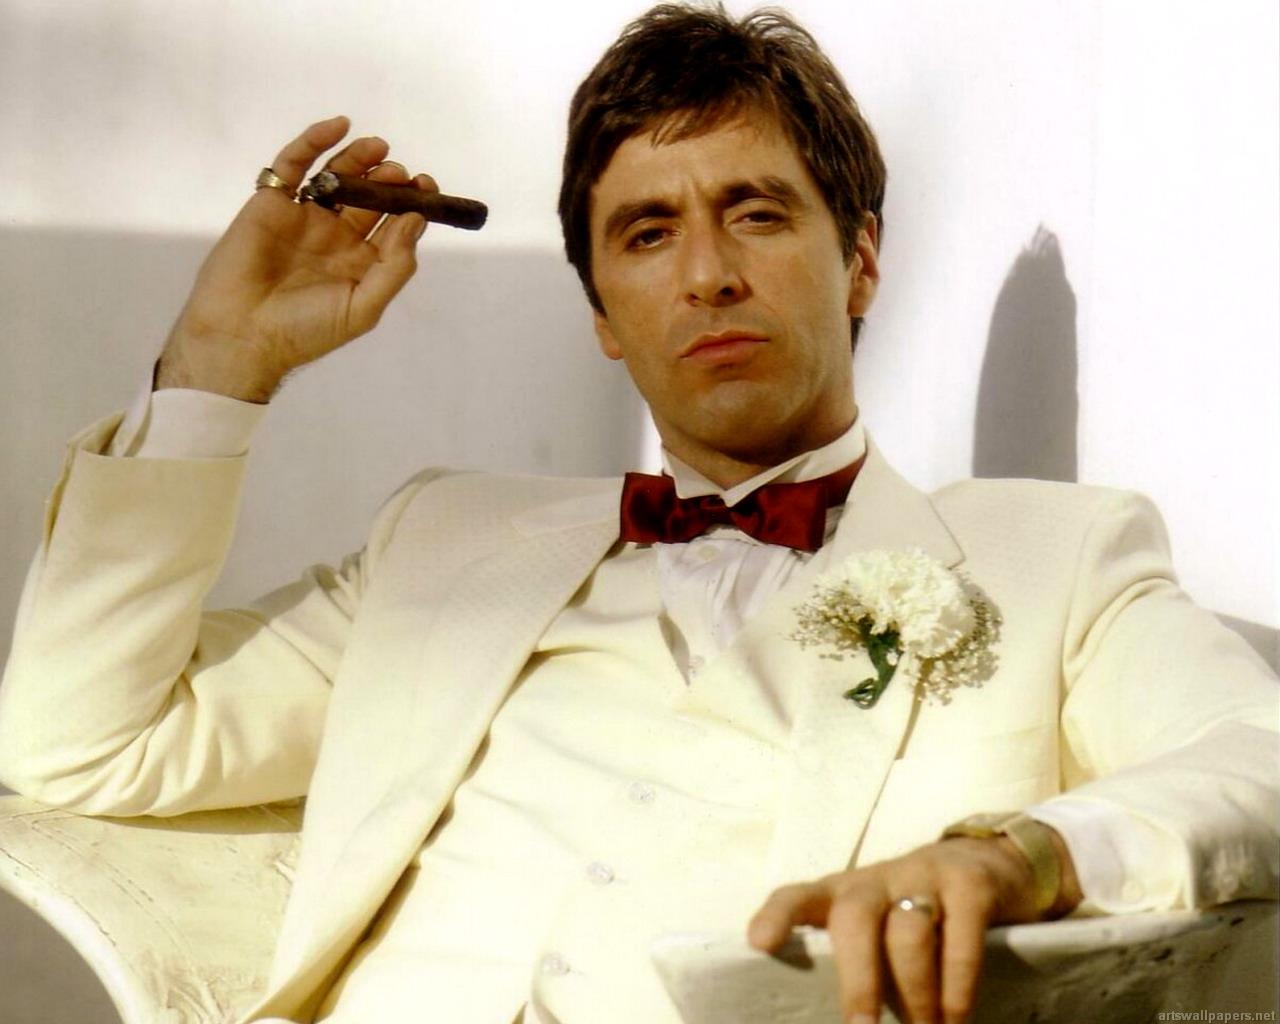 In a DePalma film, the badguys often wear white!